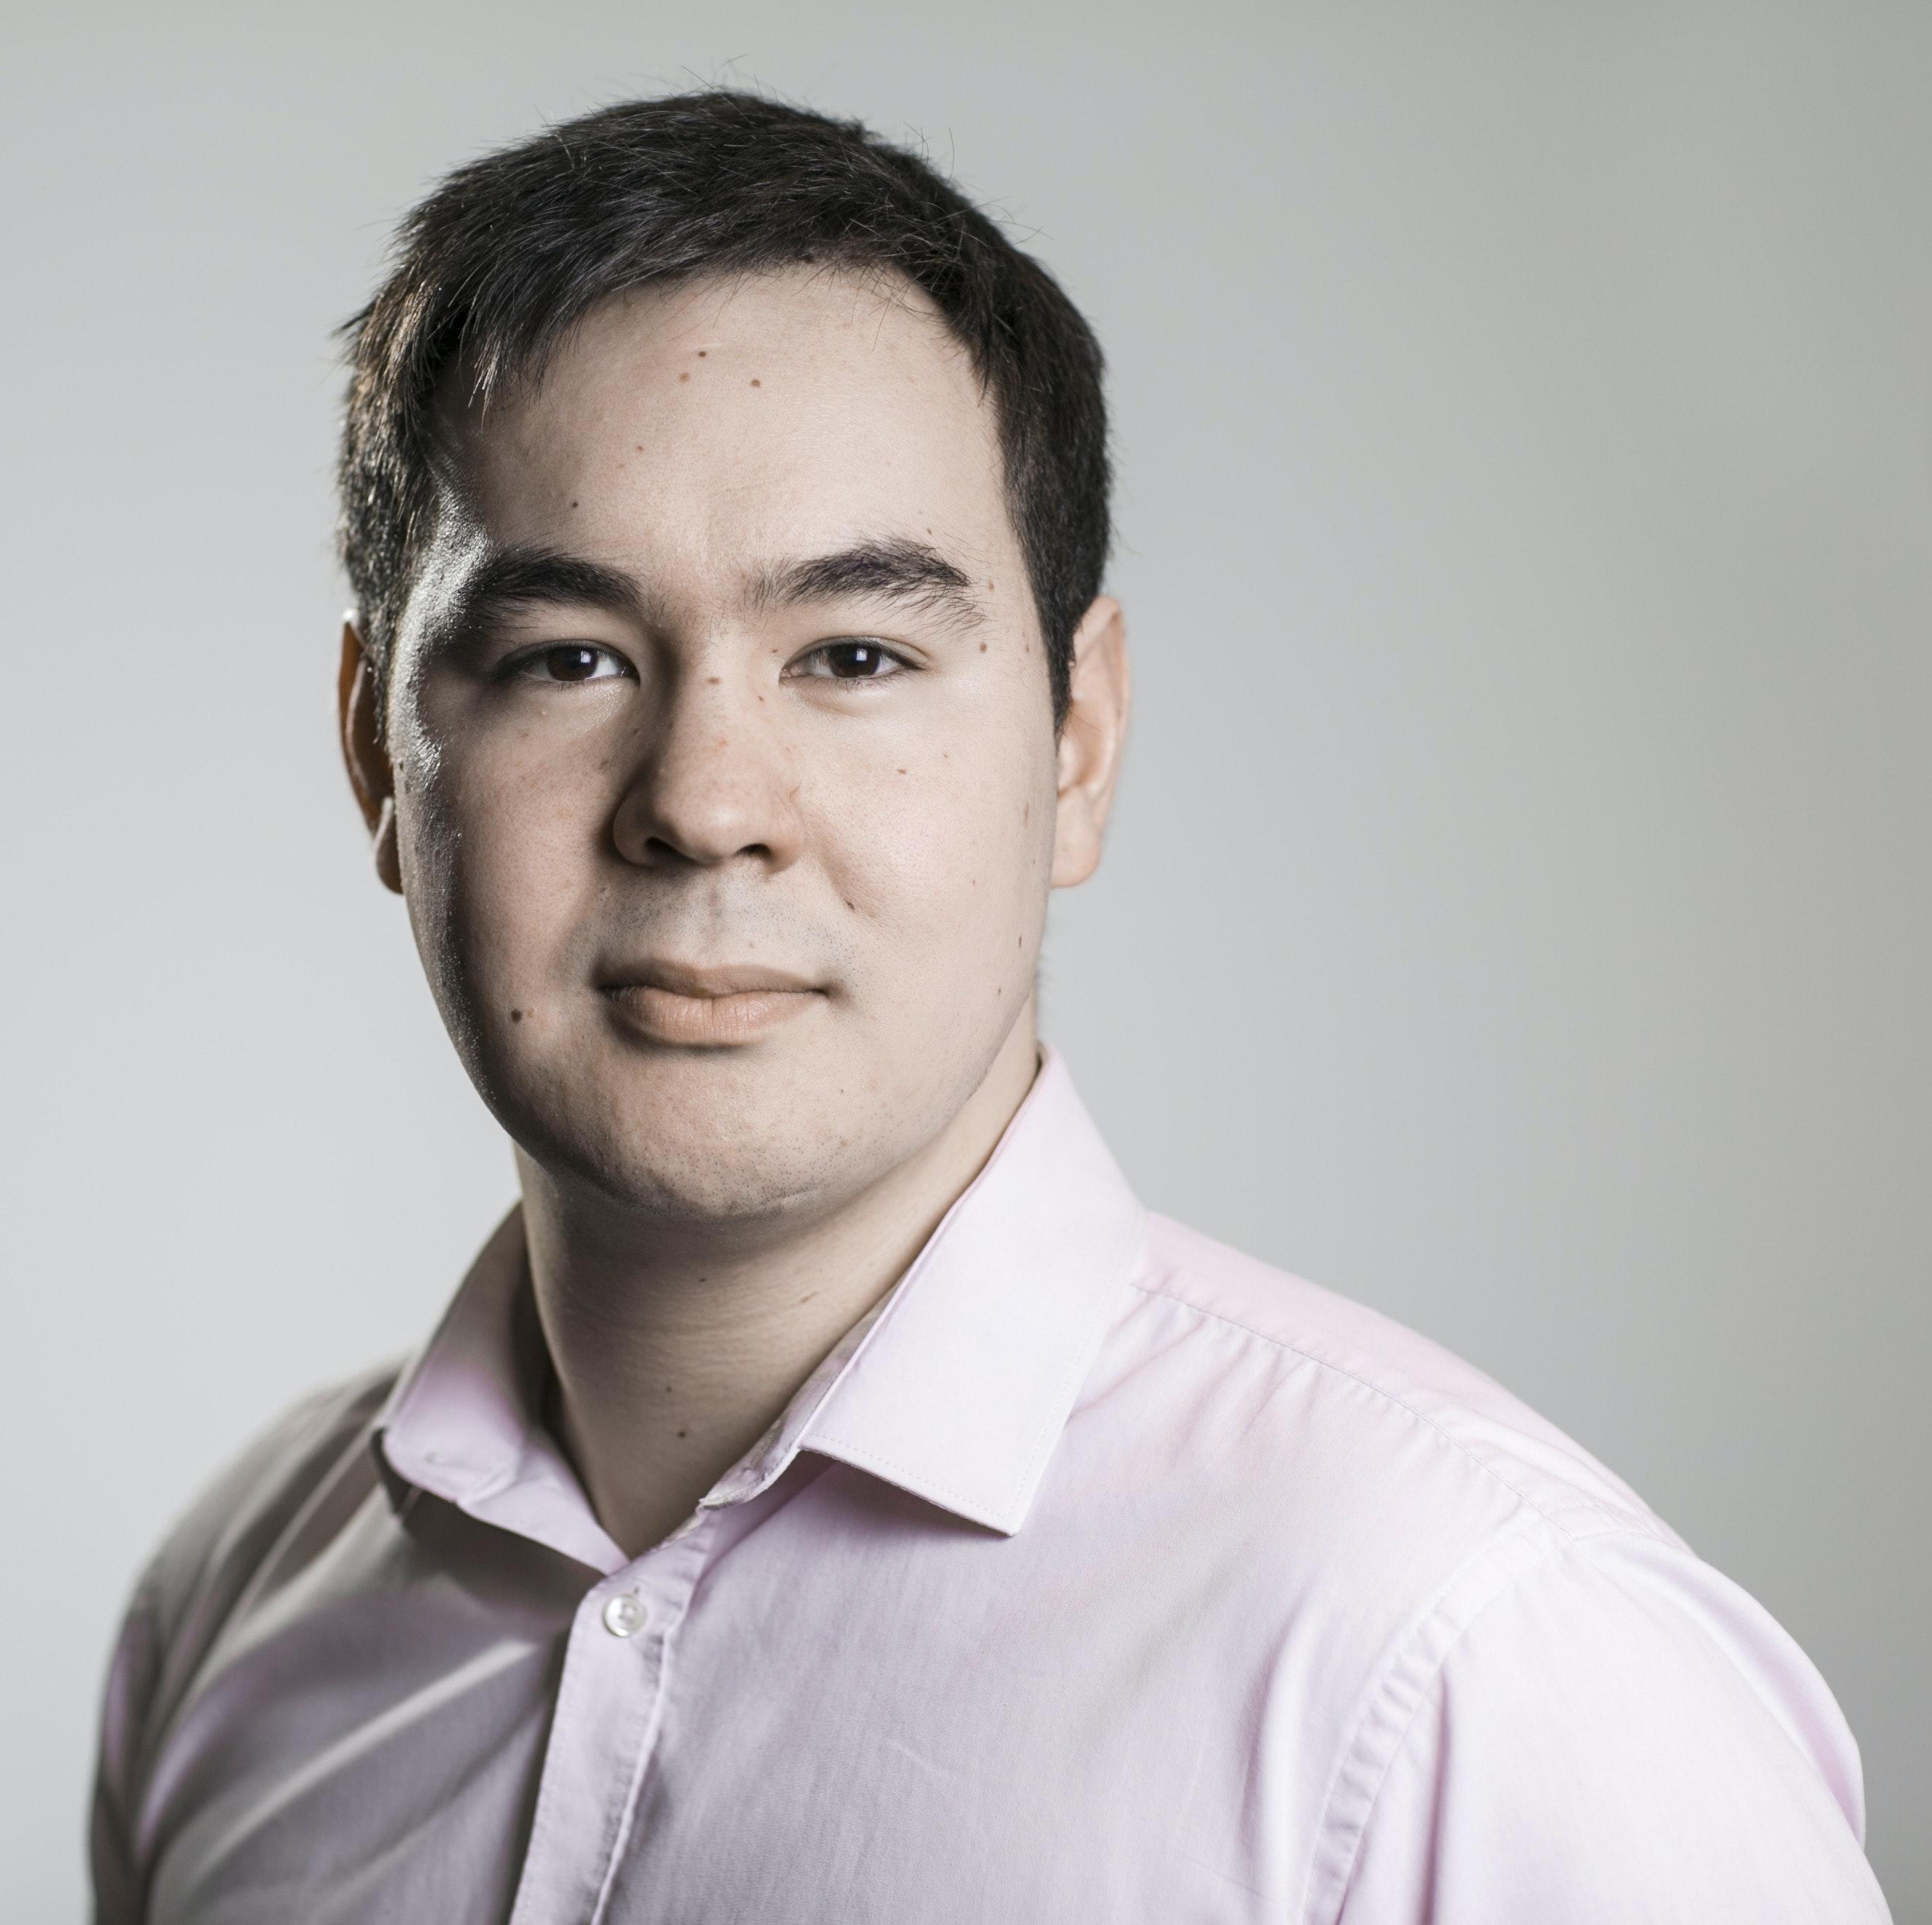 Photograph of Nick Renaud-Komiya